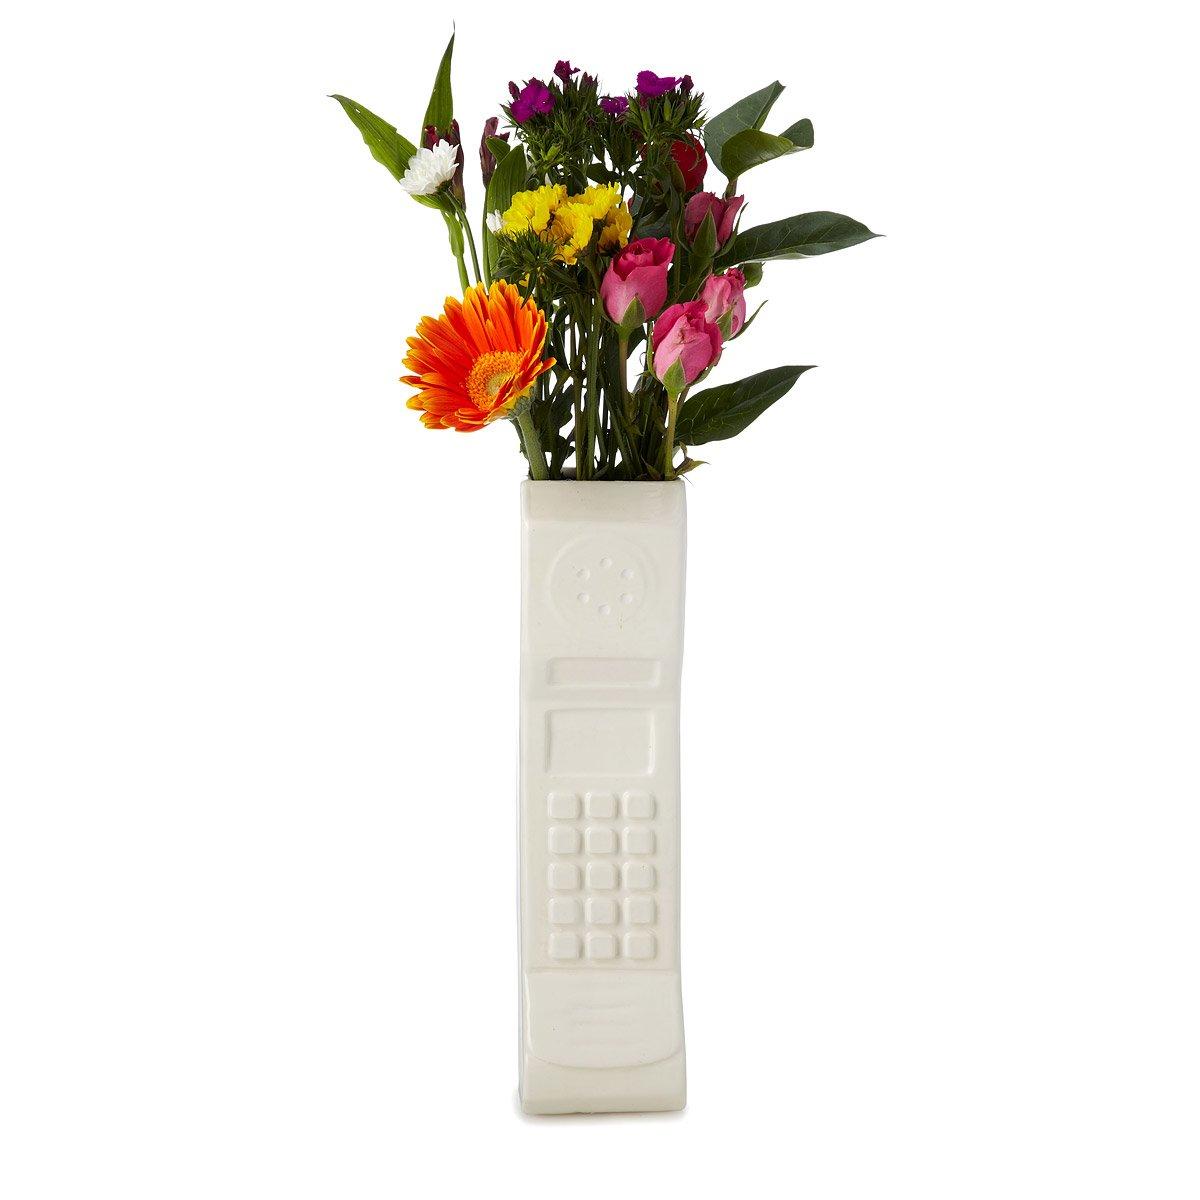 Brick phone vase retro cellphone flower vase uncommongoods brick phone vase 1 thumbnail reviewsmspy